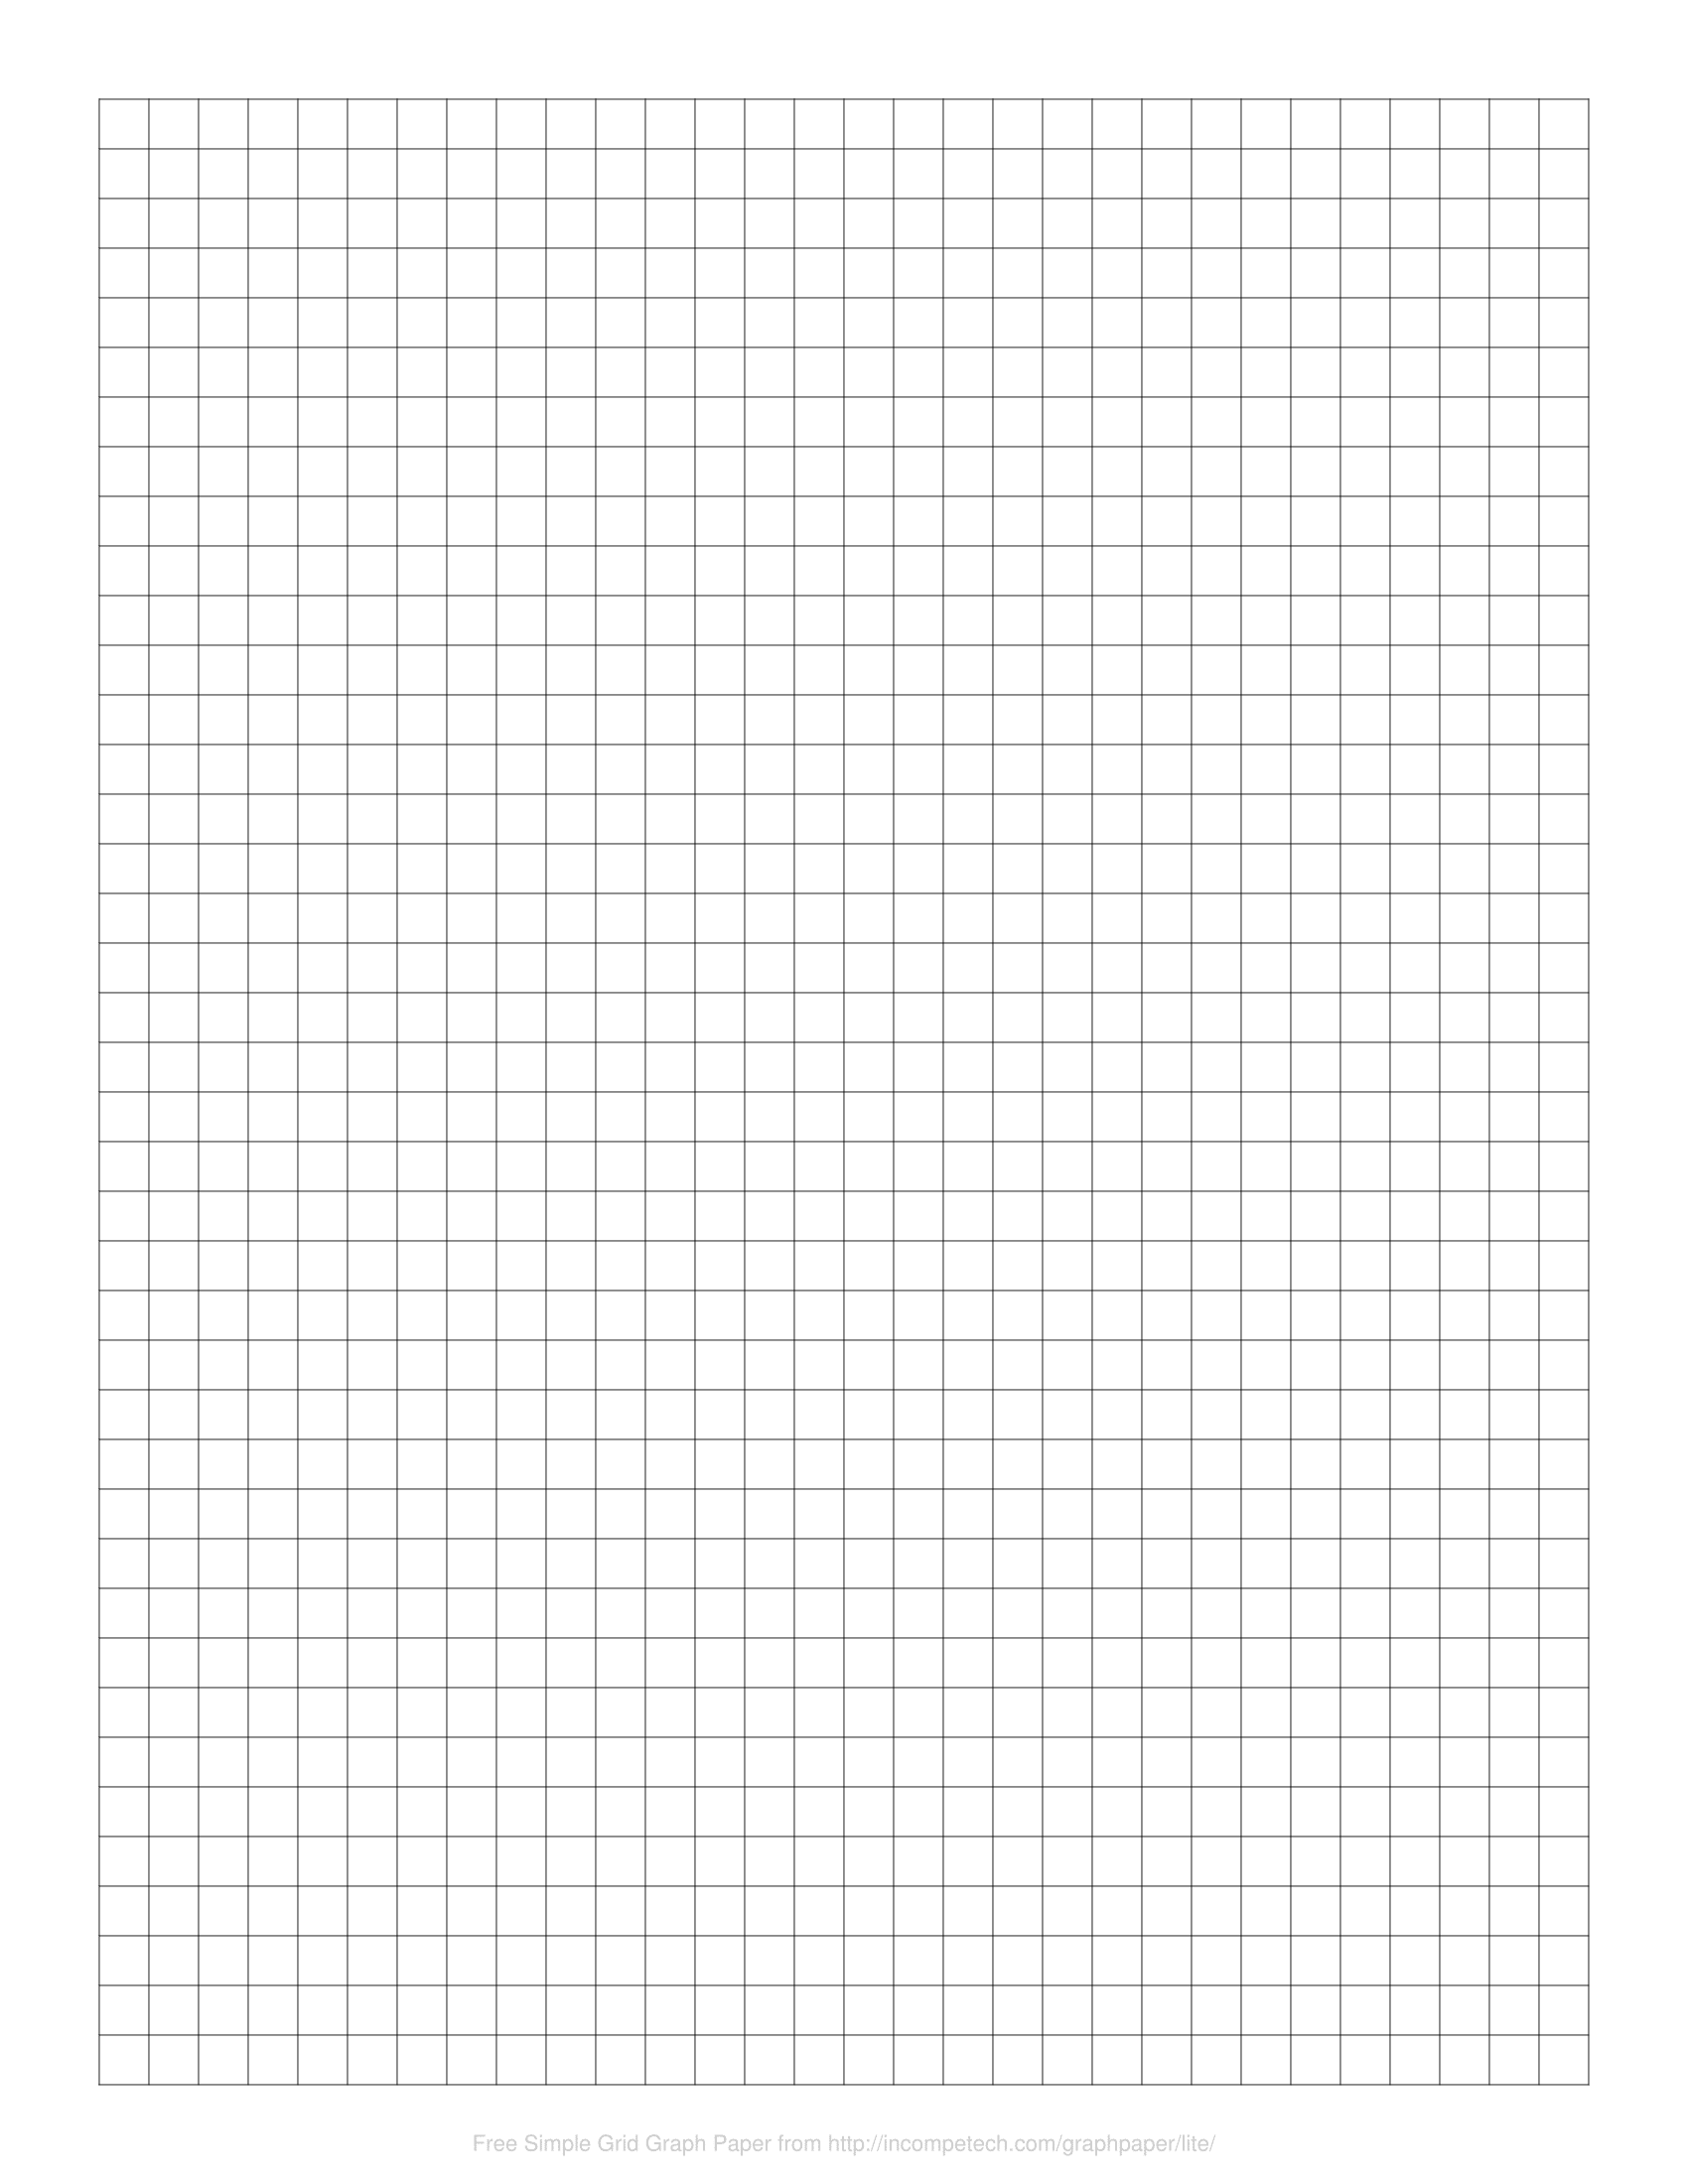 Symmetry On Graph Paper Worksheet